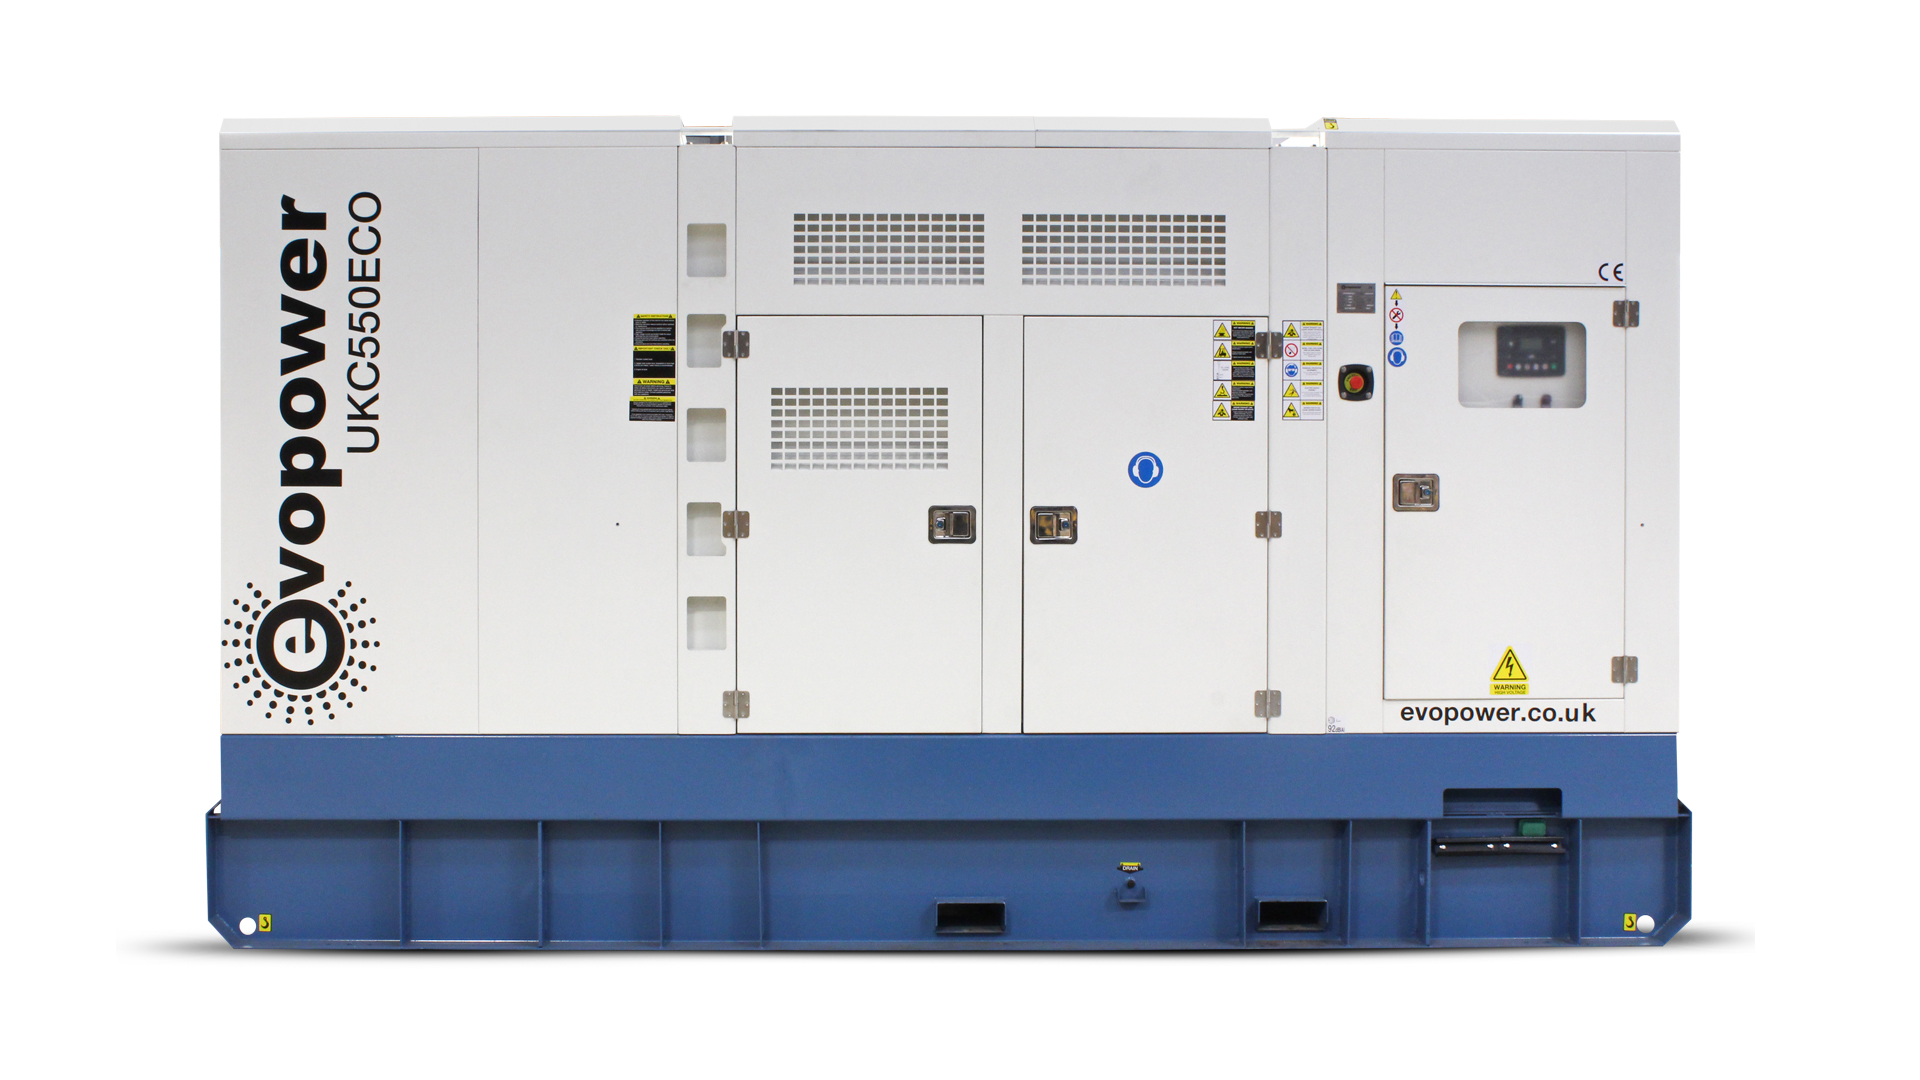 UKC550ECO 550kVA diesel generator external front view